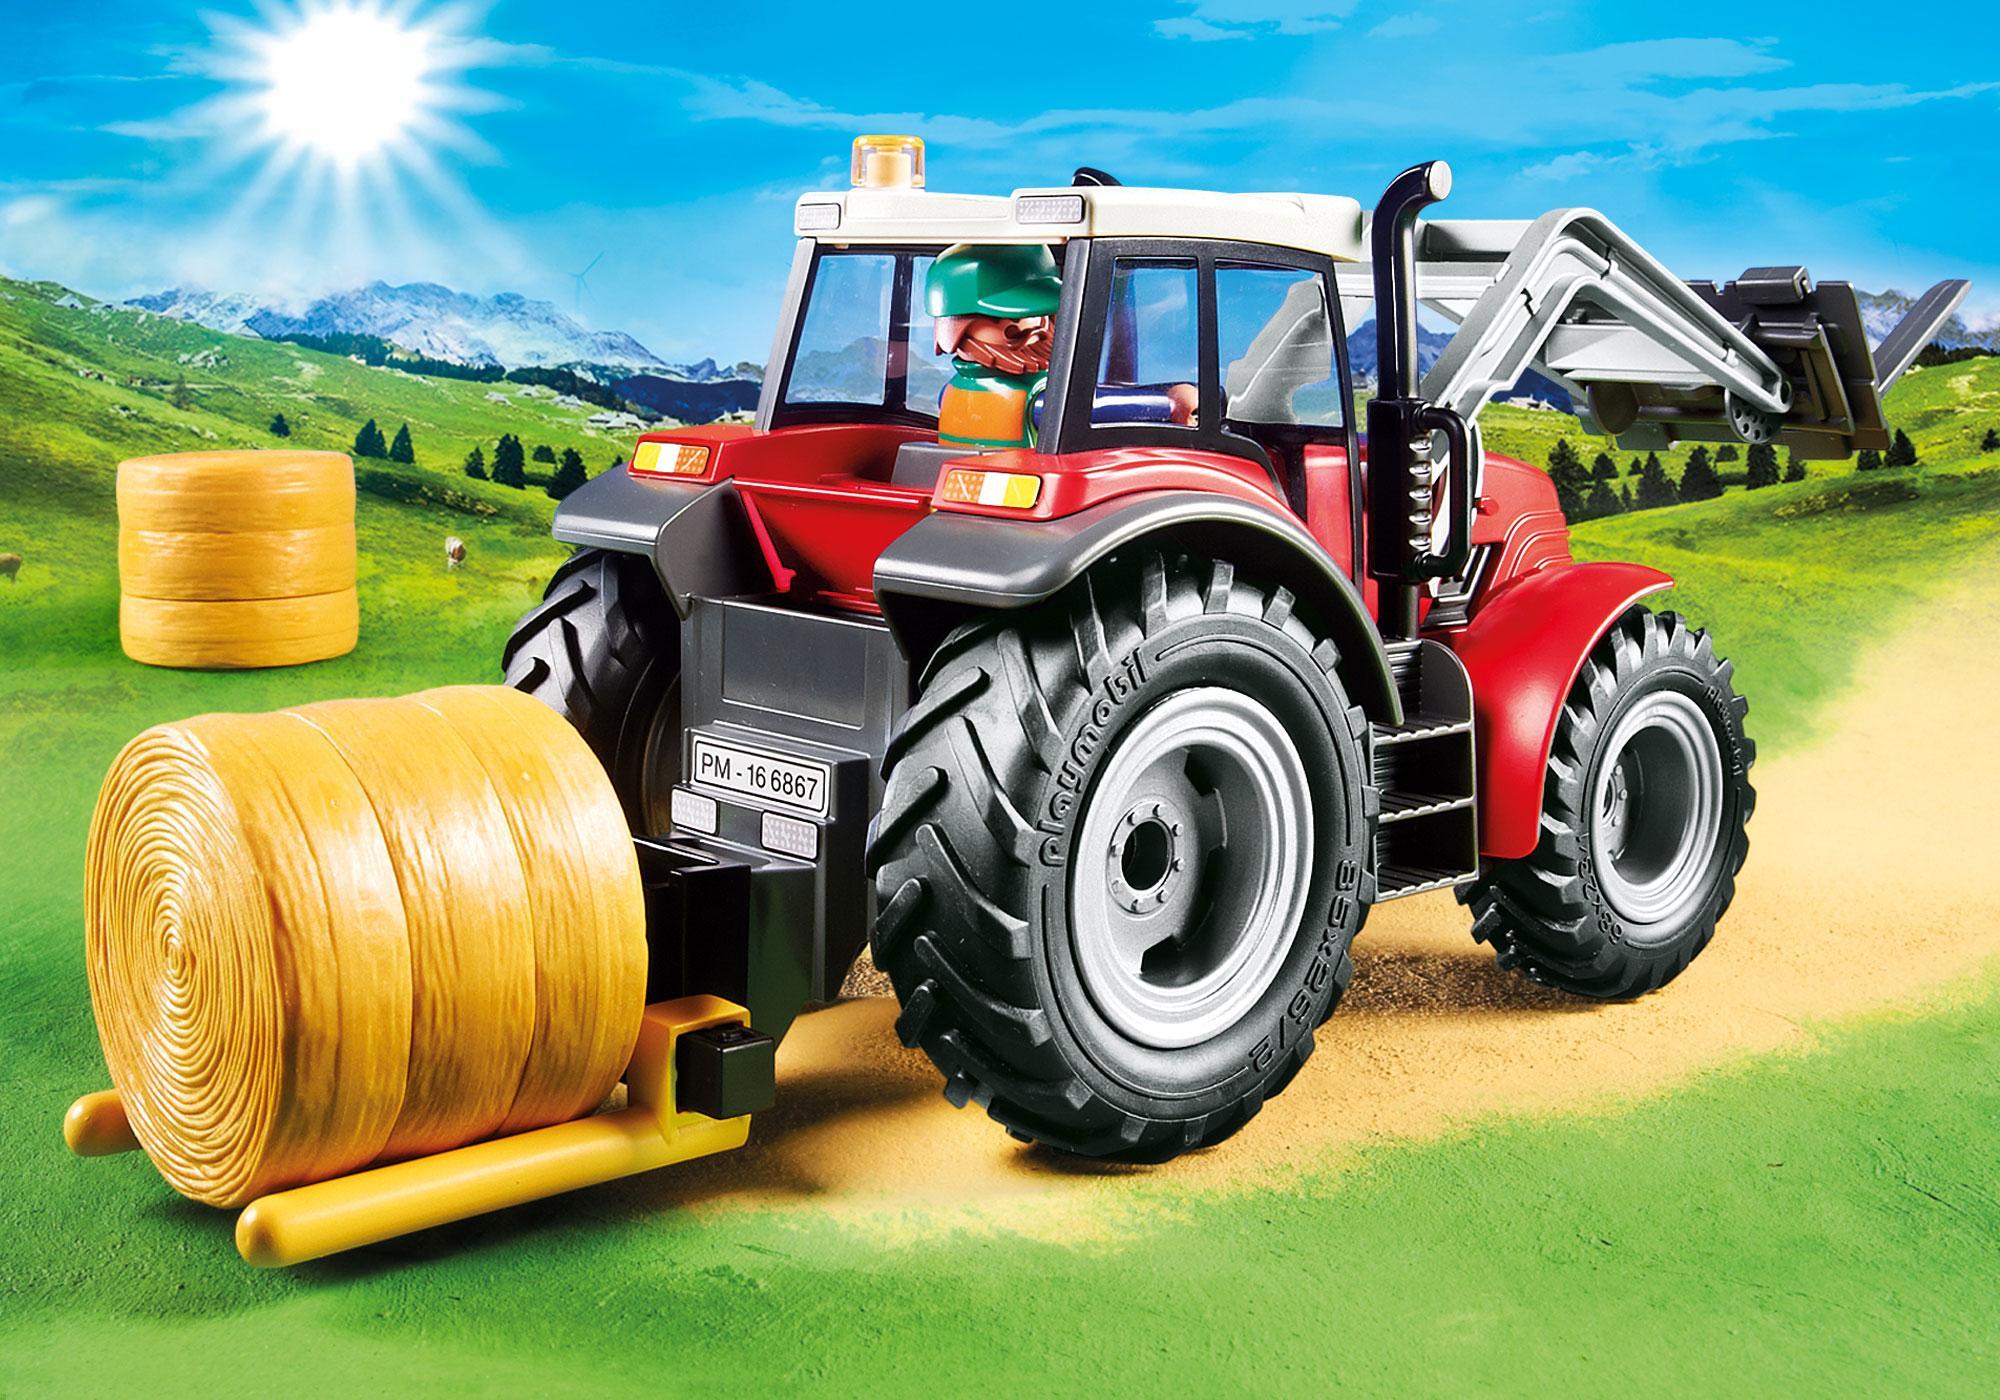 http://media.playmobil.com/i/playmobil/6867_product_extra1/Tractor